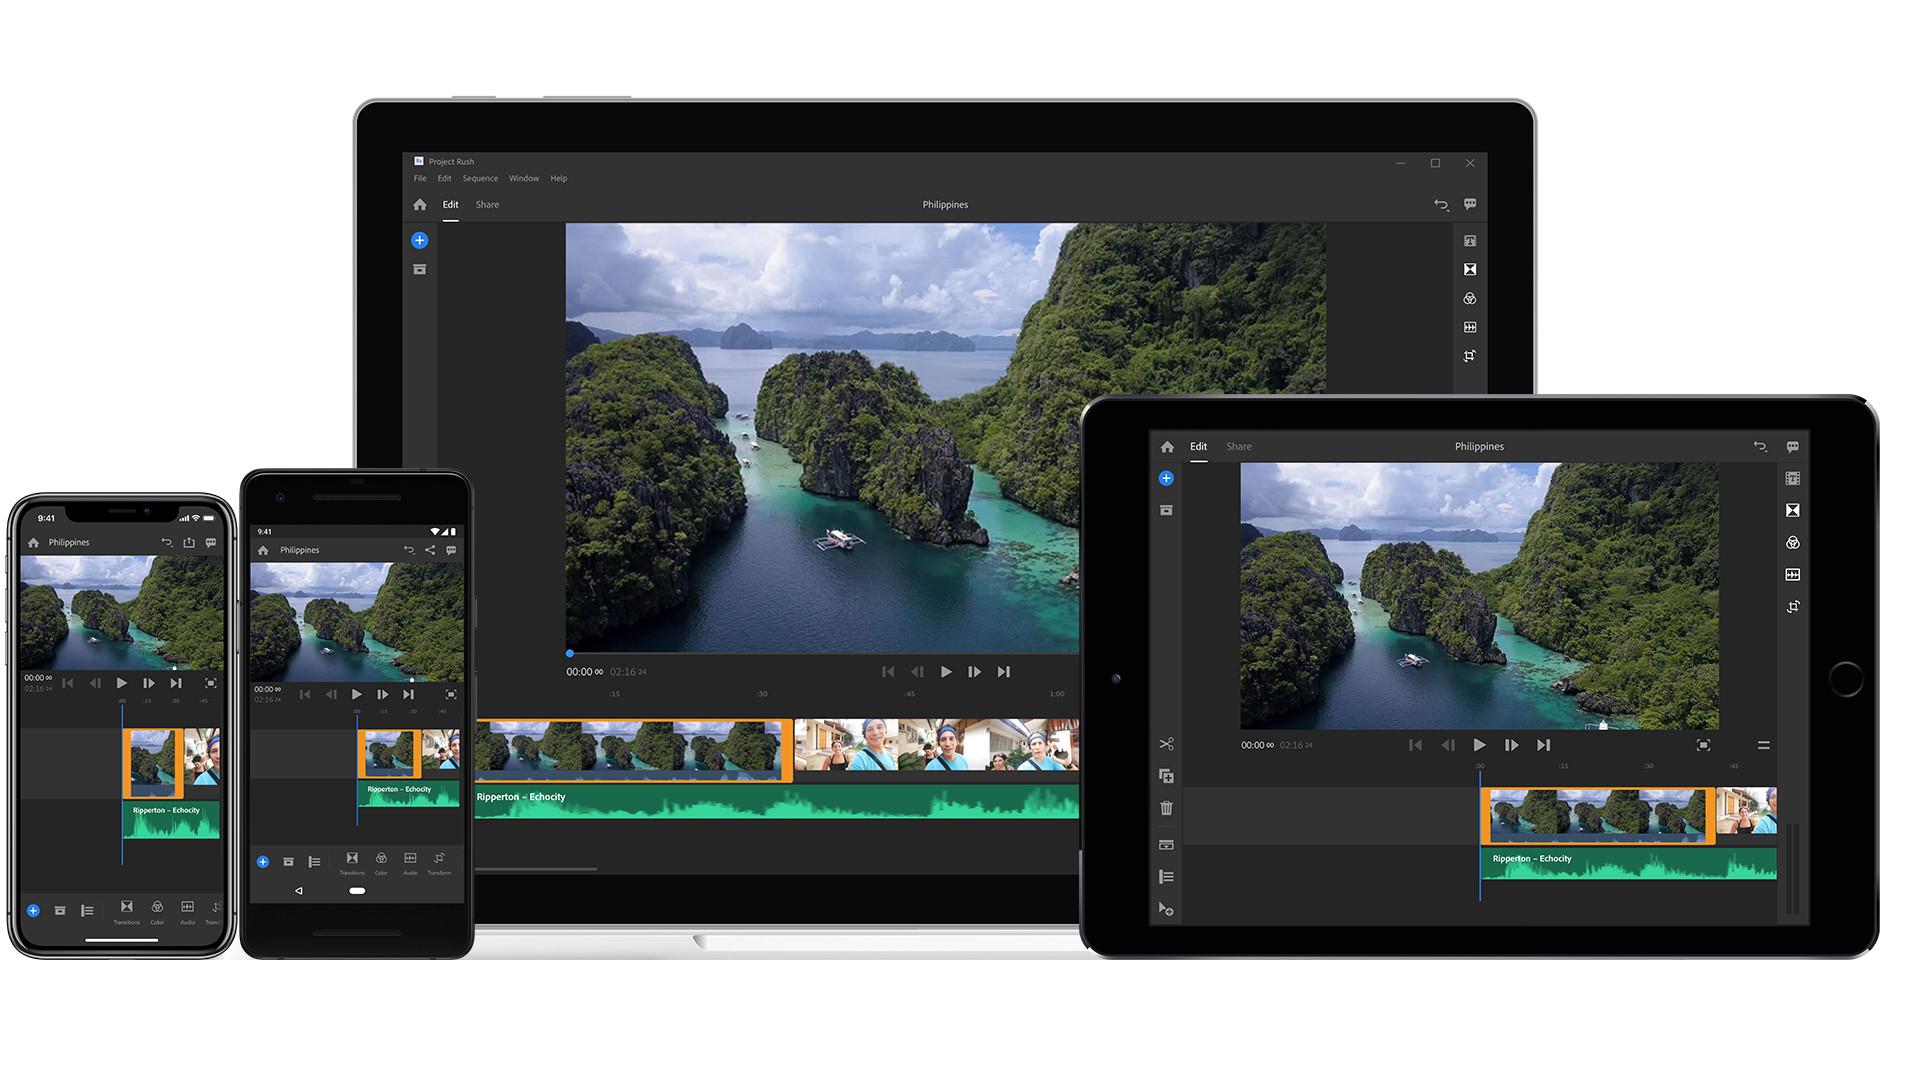 Adobe Project Rush - モバイル端末で撮影から編集、配信まで